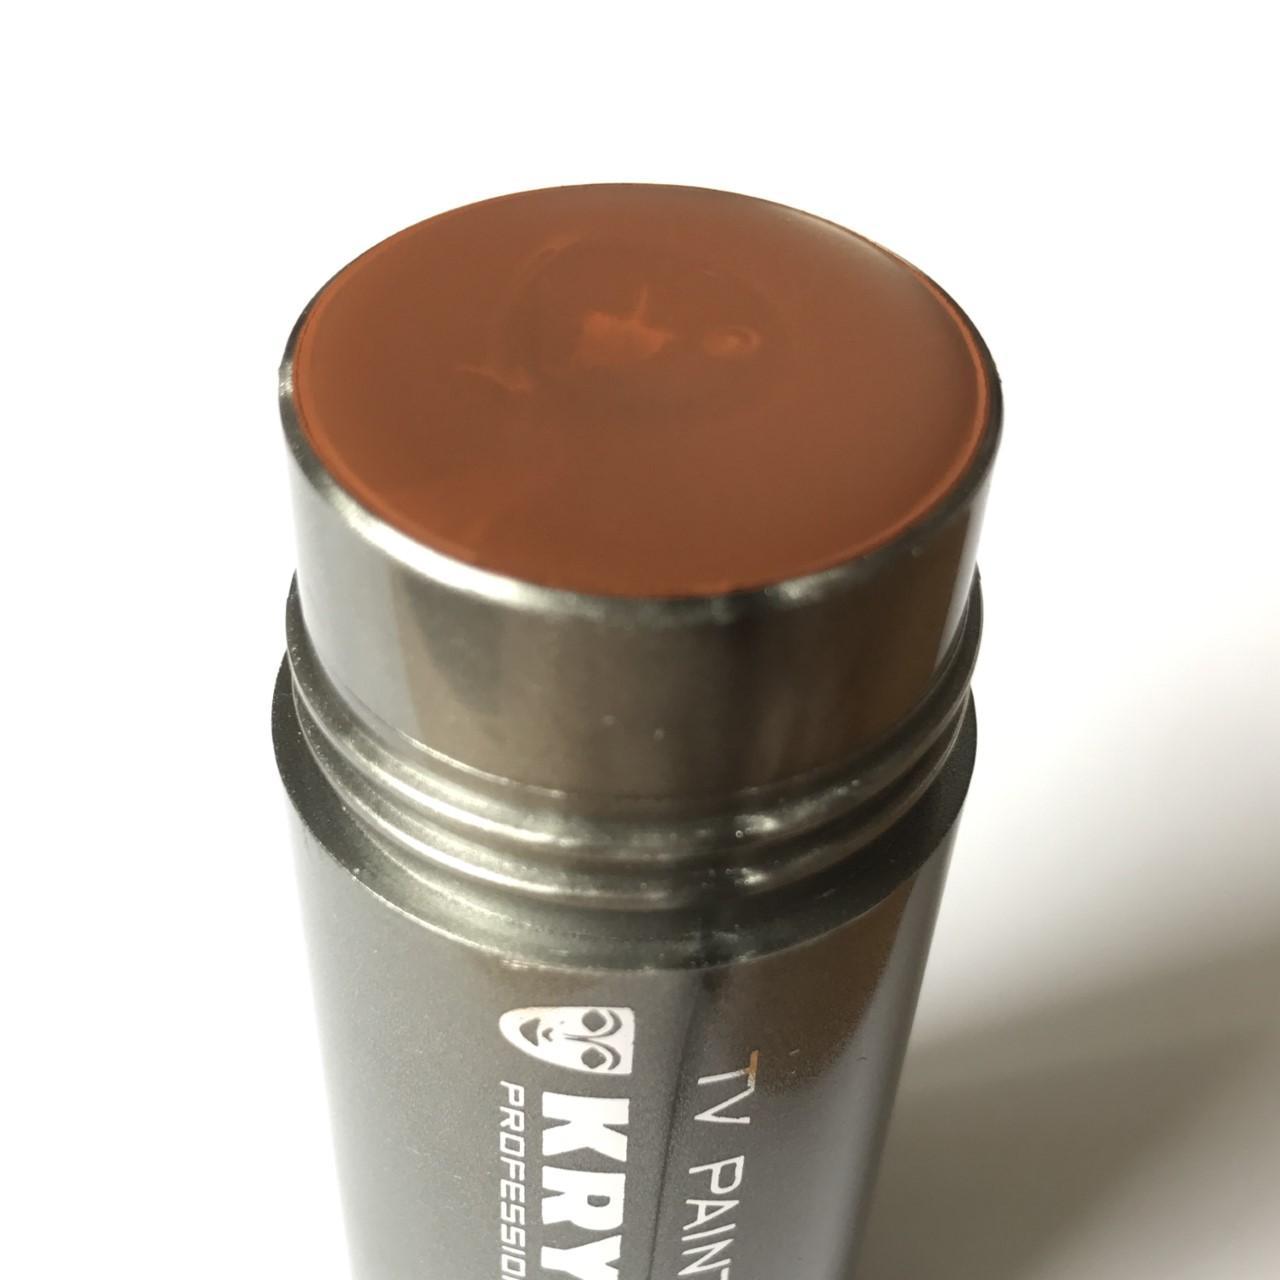 Maquillage kryolan paint stick 5047 ng2